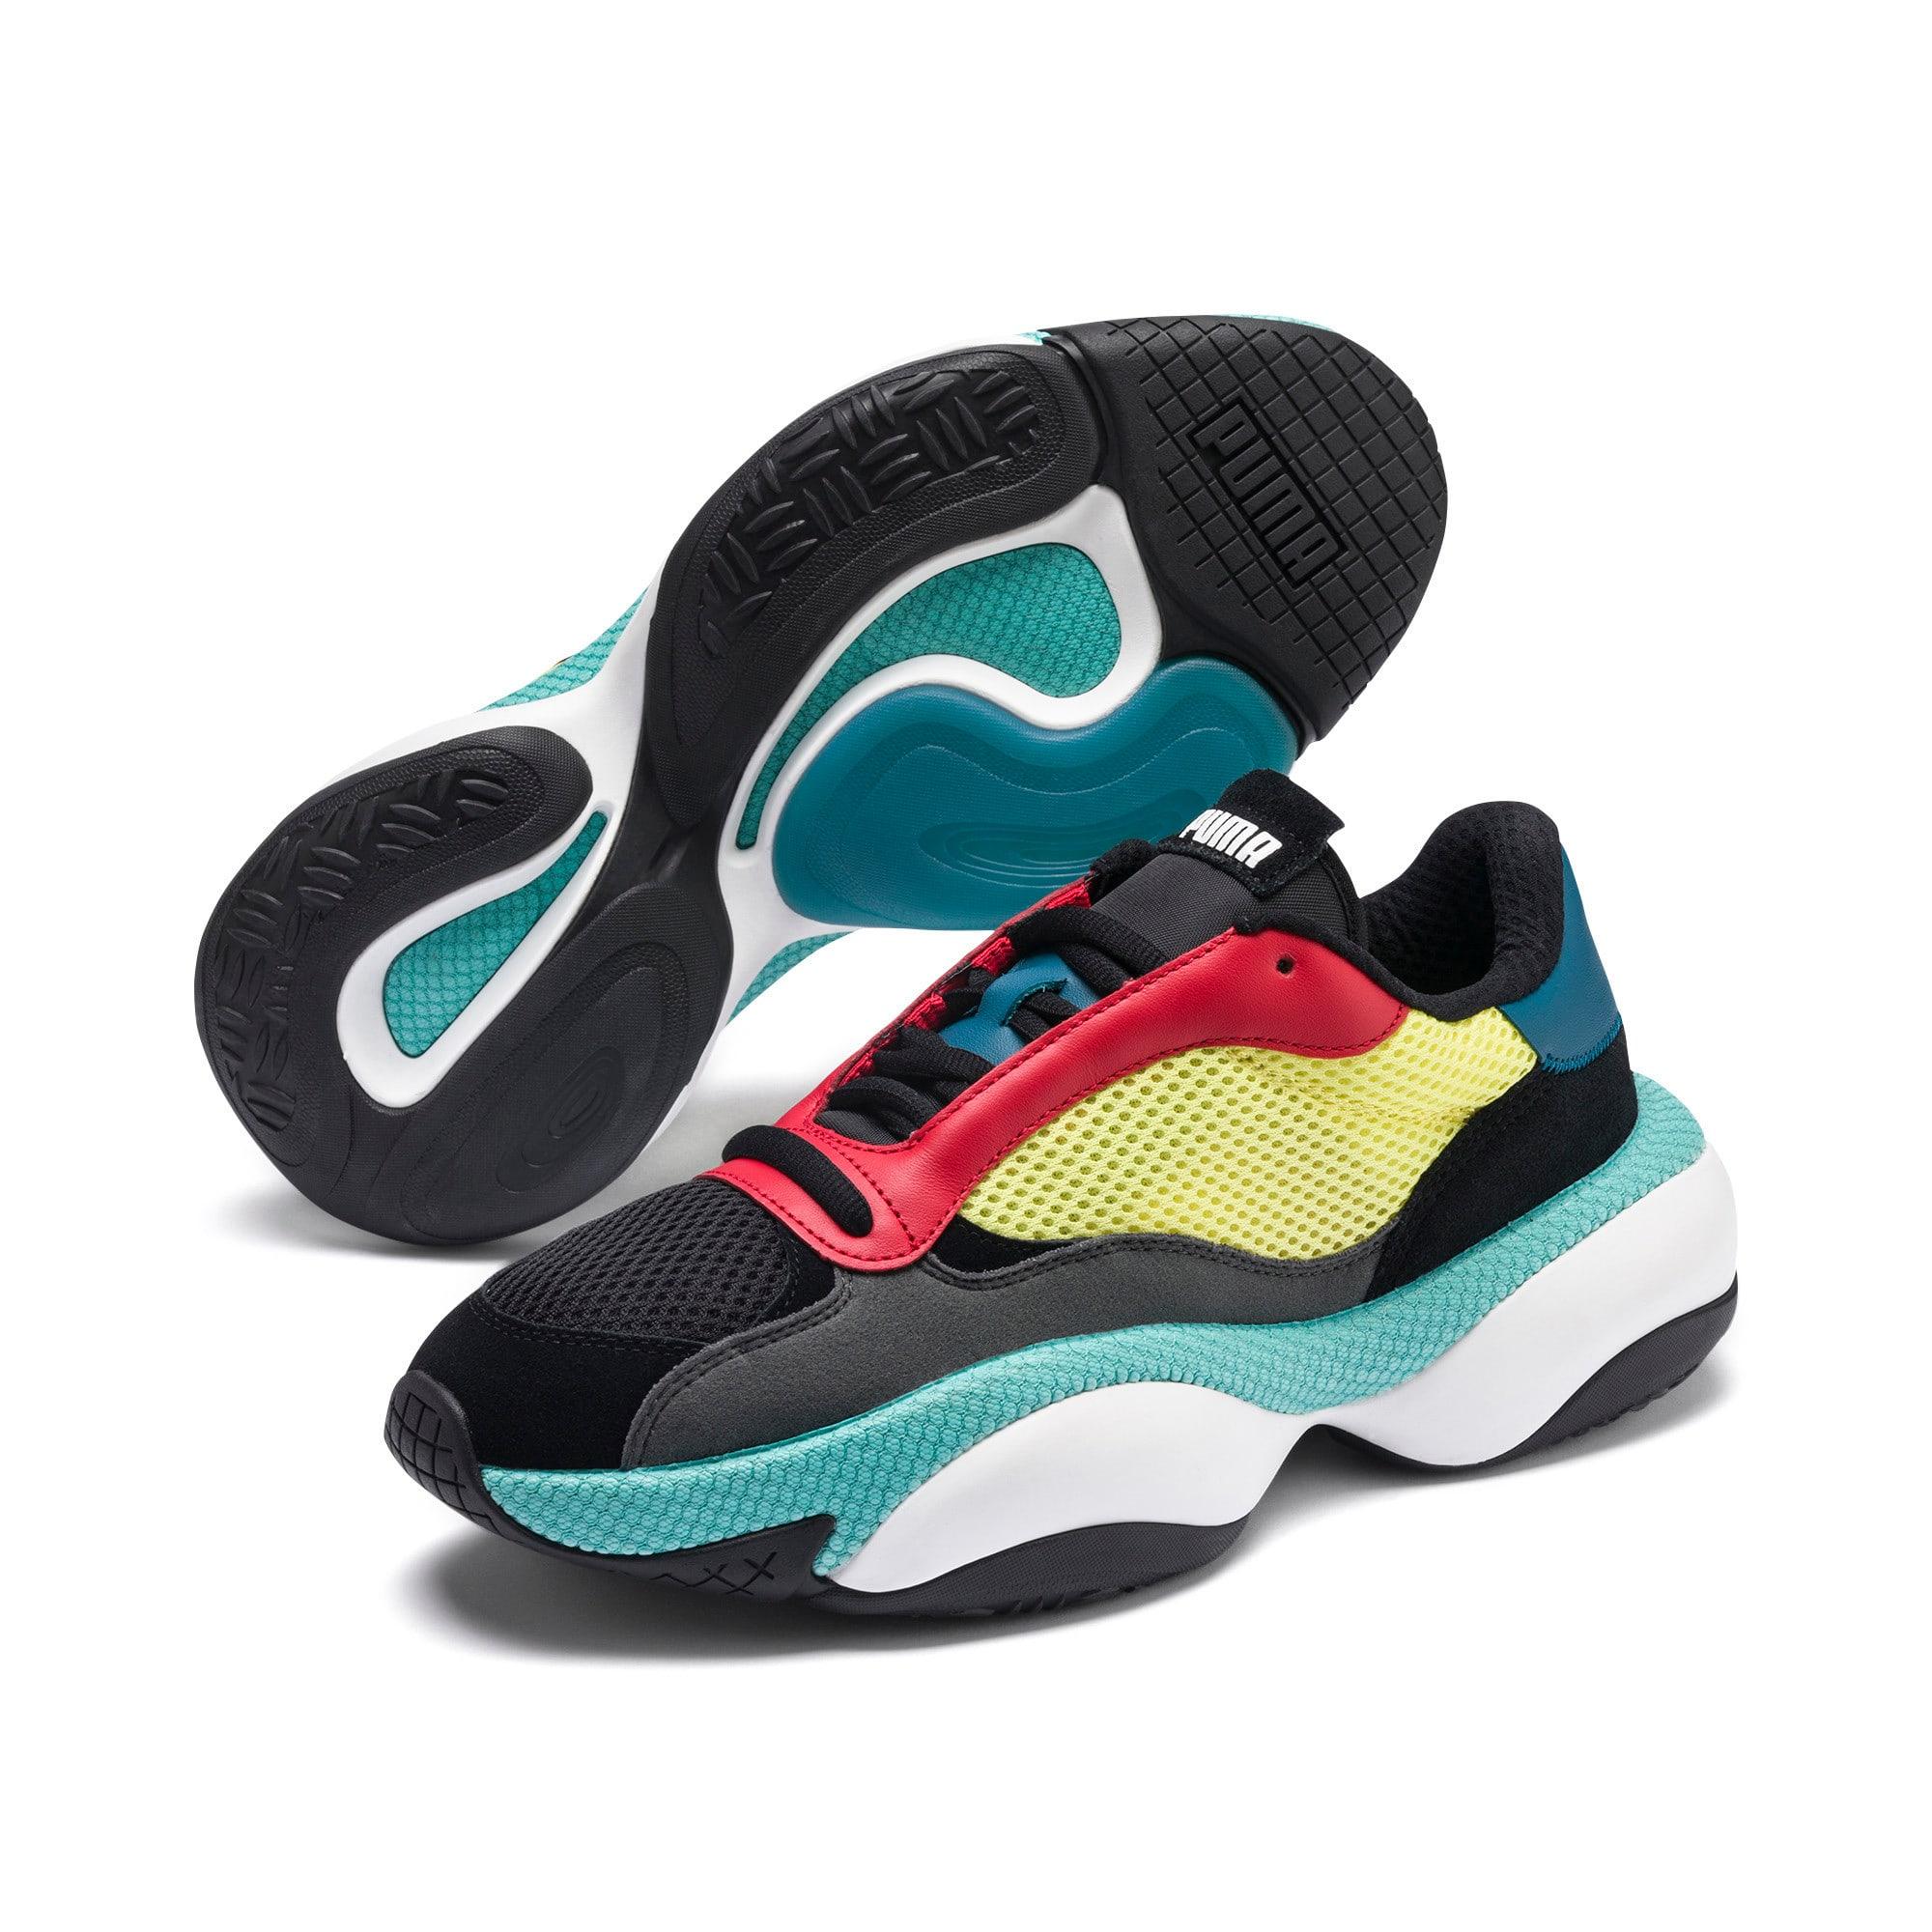 Thumbnail 2 of Alteration Kurve Sneakers, Puma Black-Limelight, medium